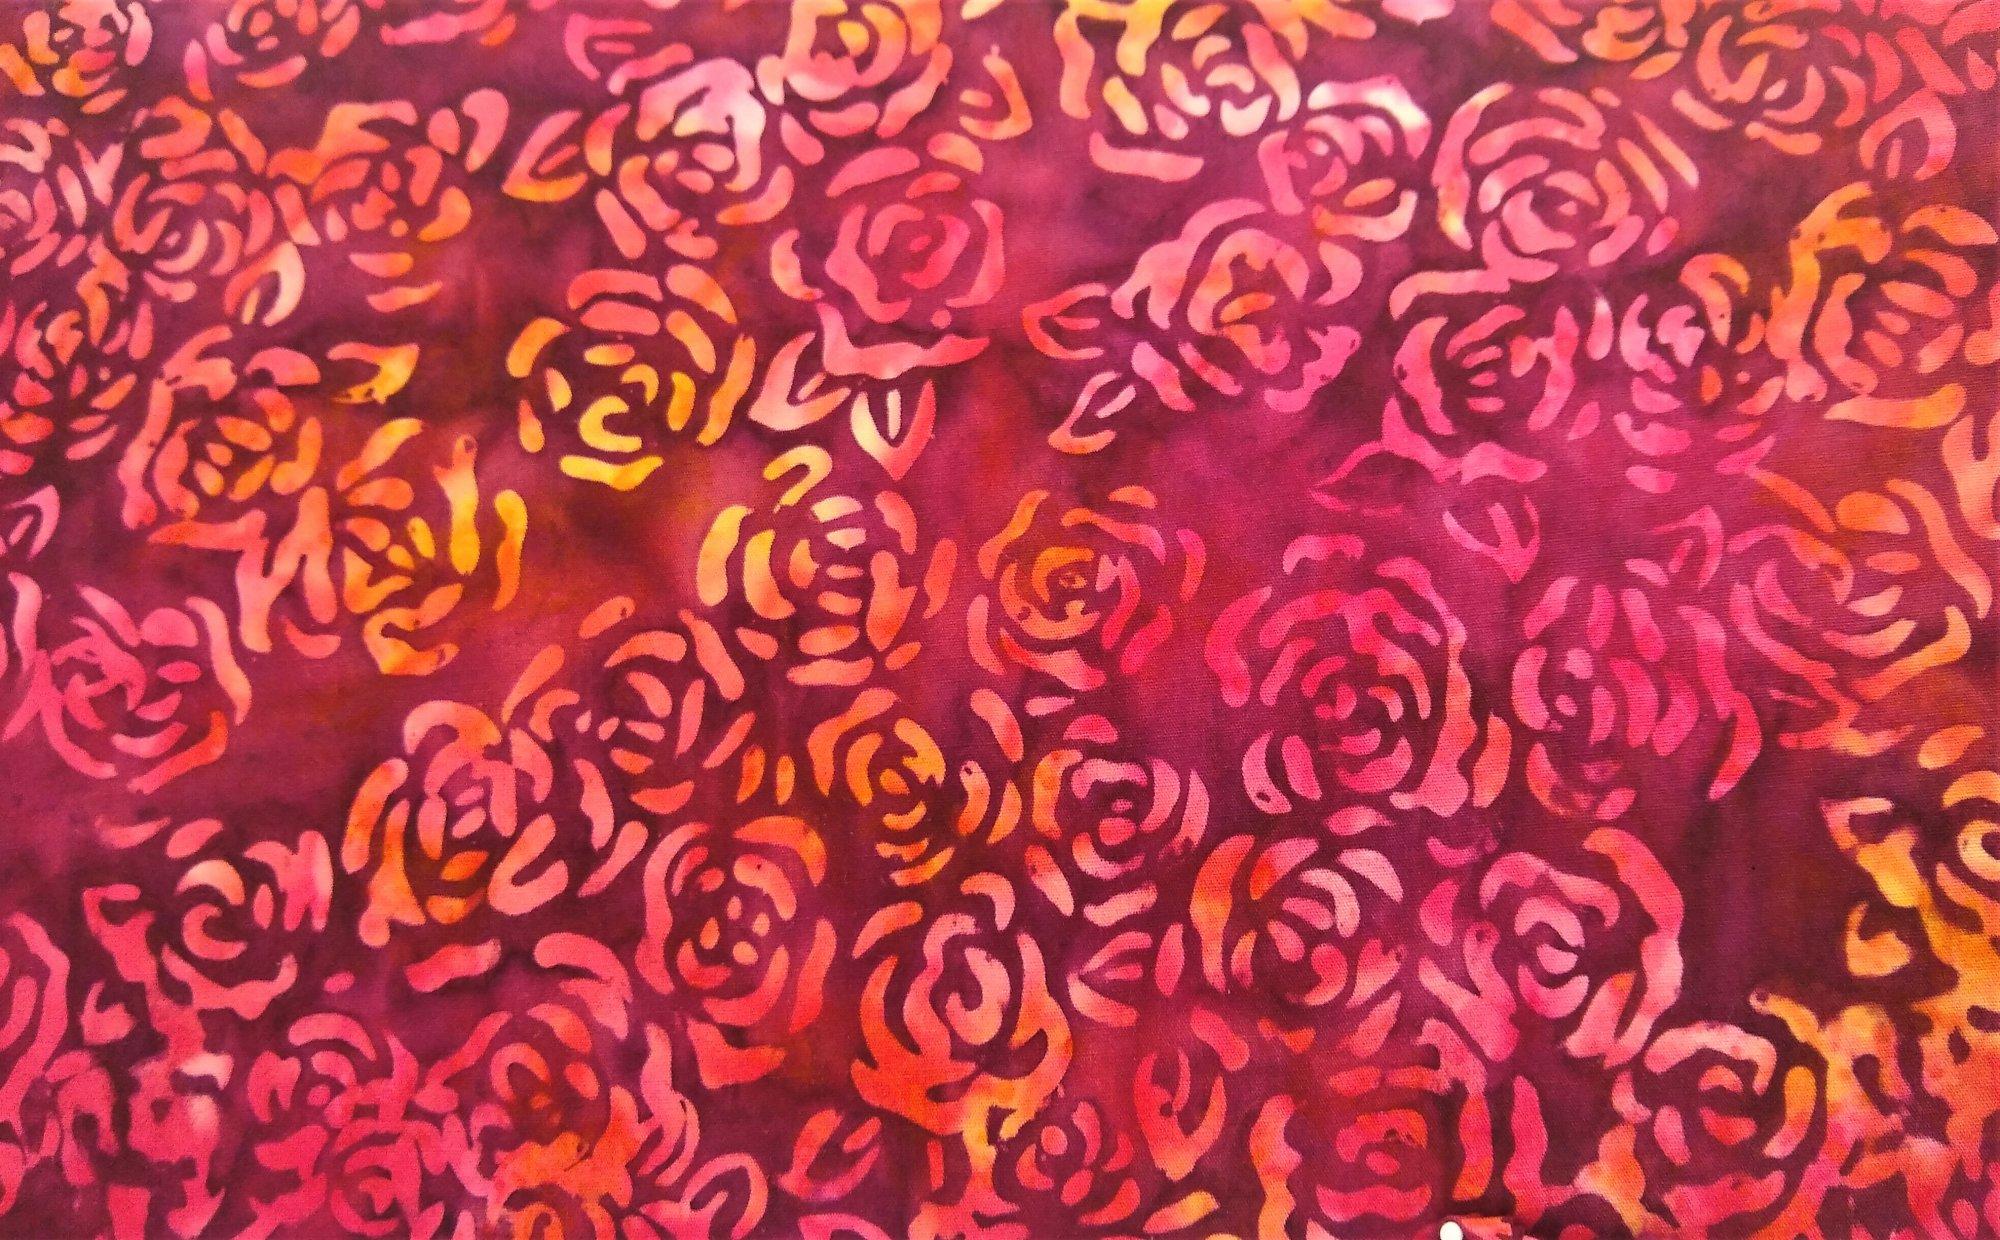 Roses Allover - Raspberry Batik - CD-03347-001A